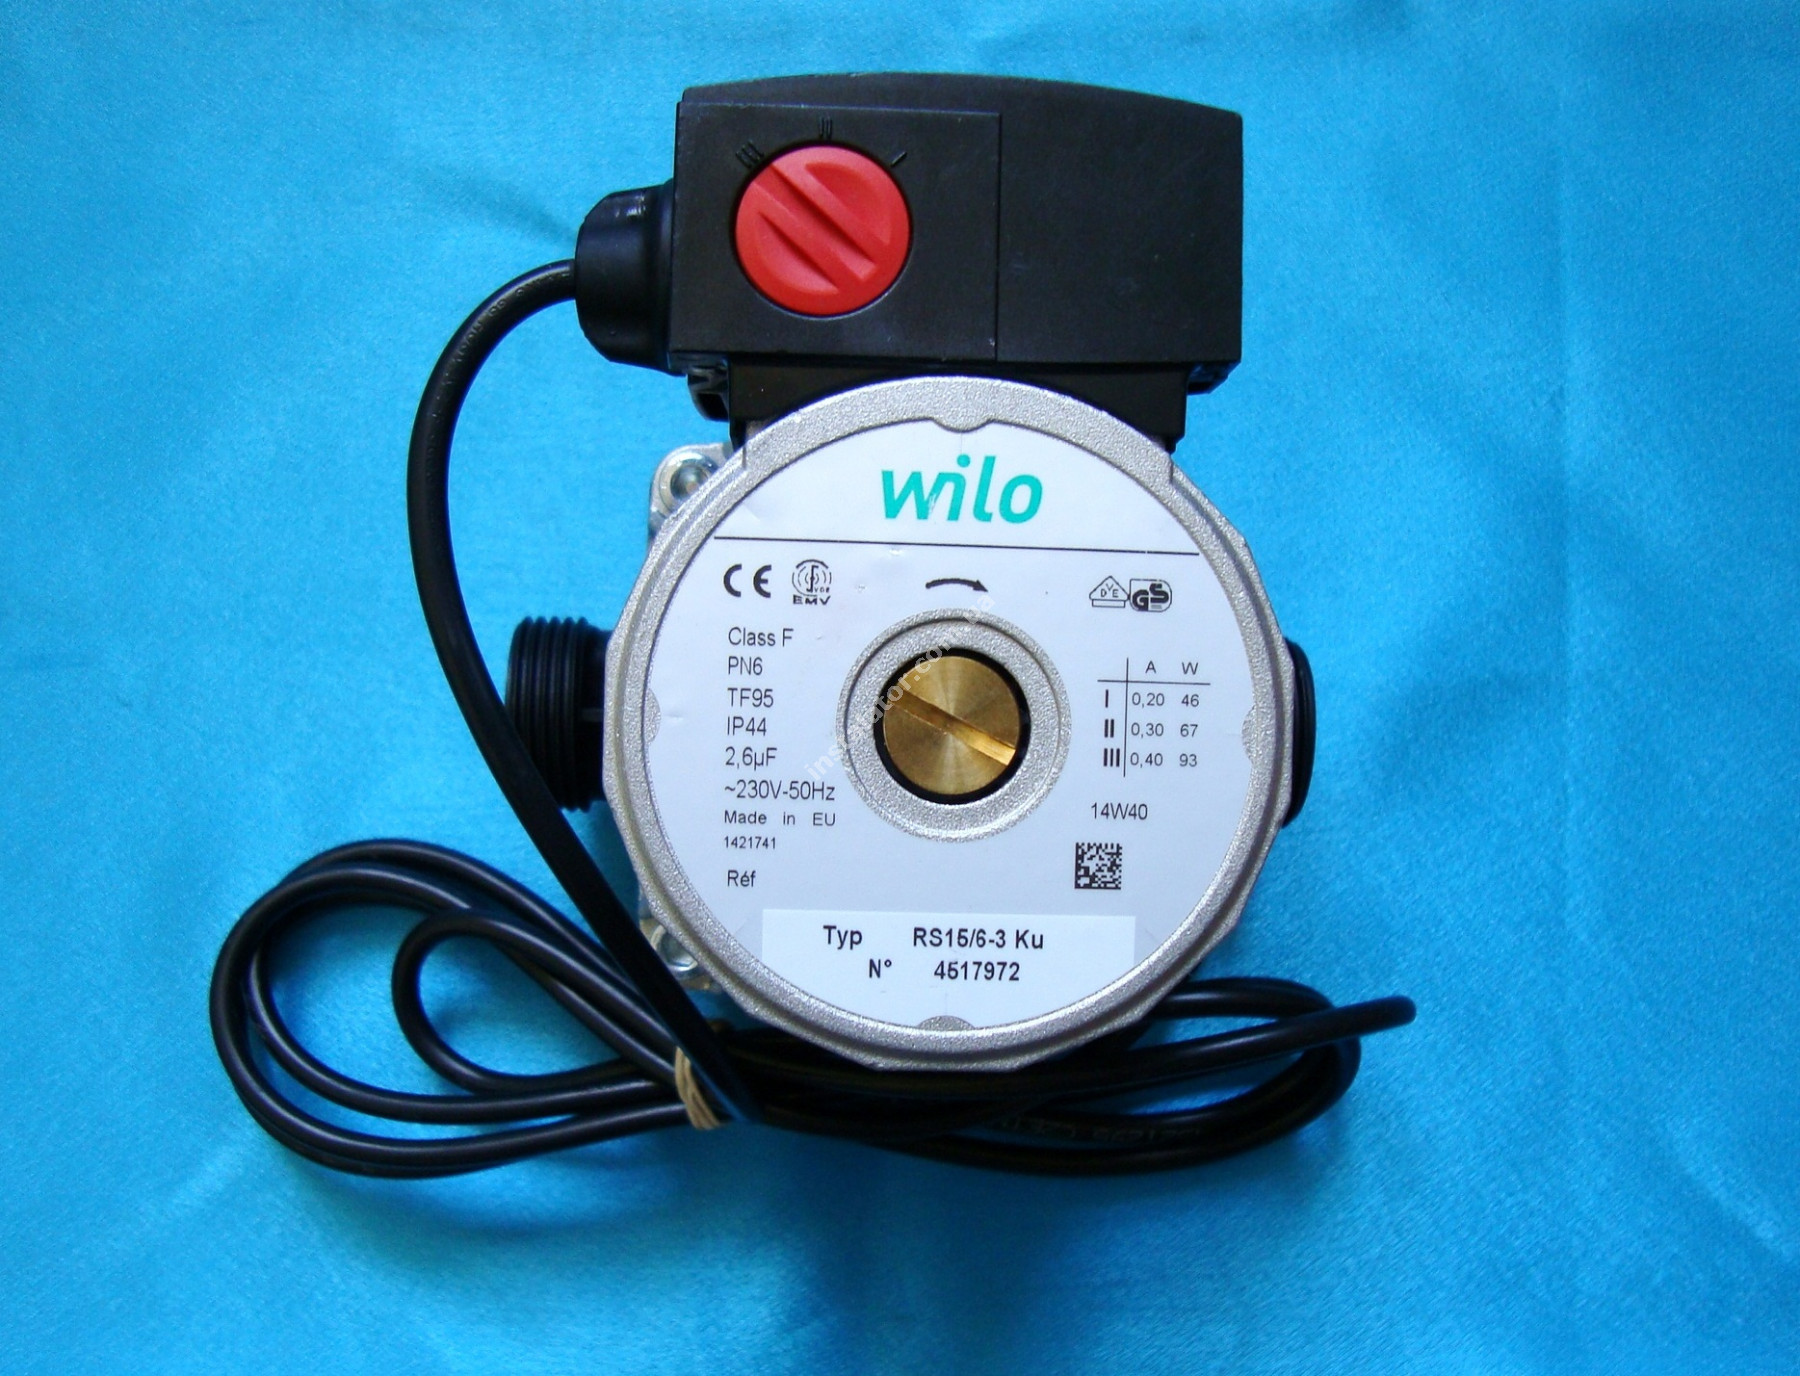 Циркуляційний насос Wilo RS 15/6 база 130 full-image-2